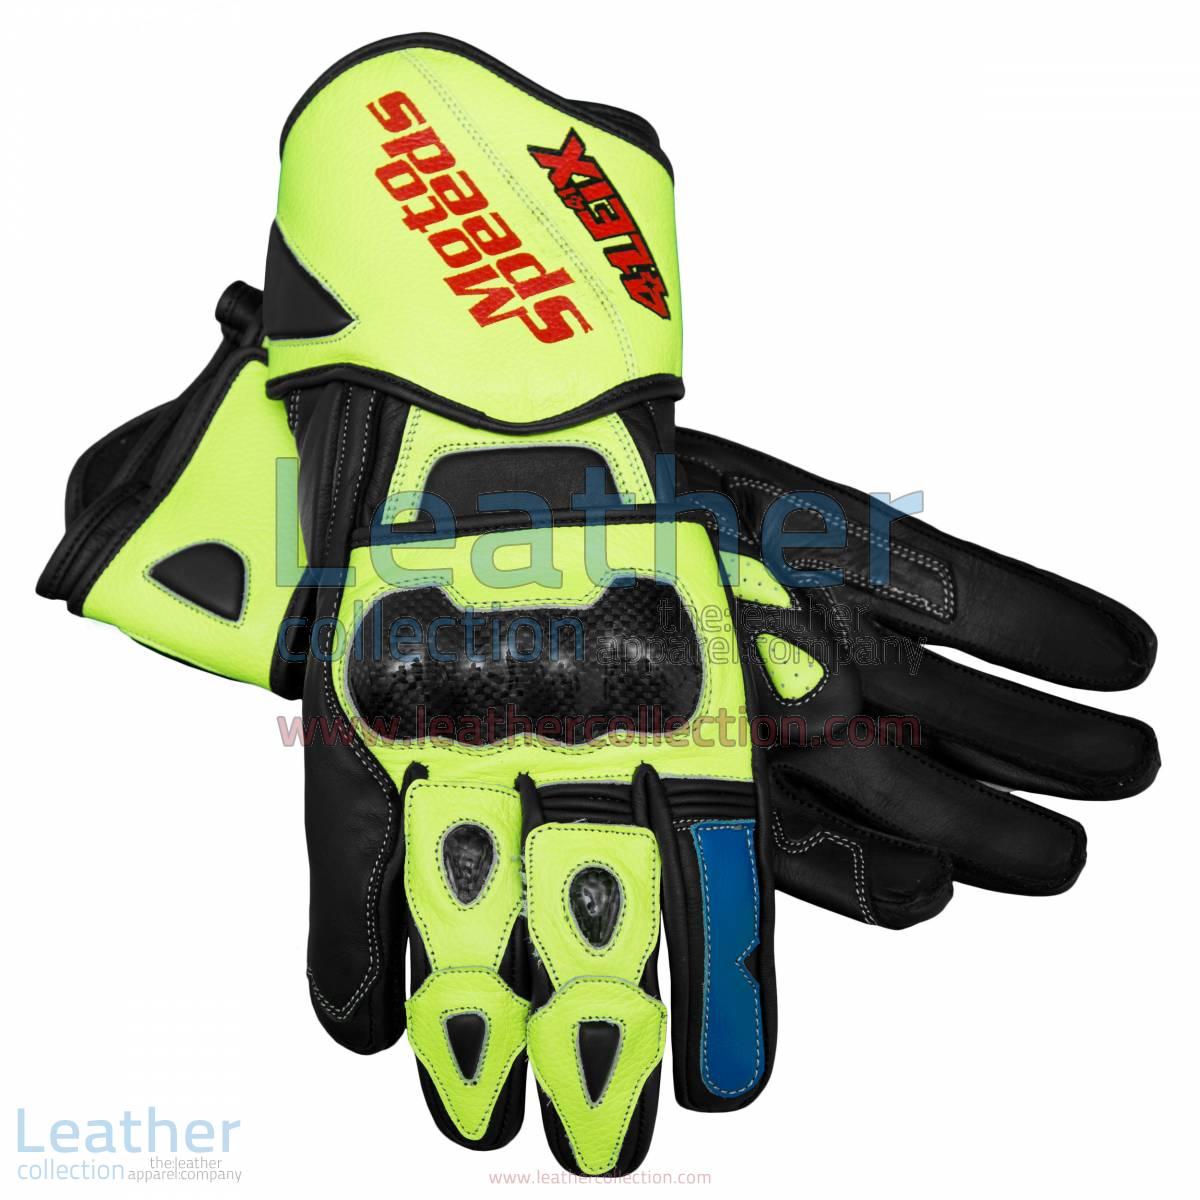 Aleix Espargaro 2015 Motorbike Race Gloves | Aleix Espargaro